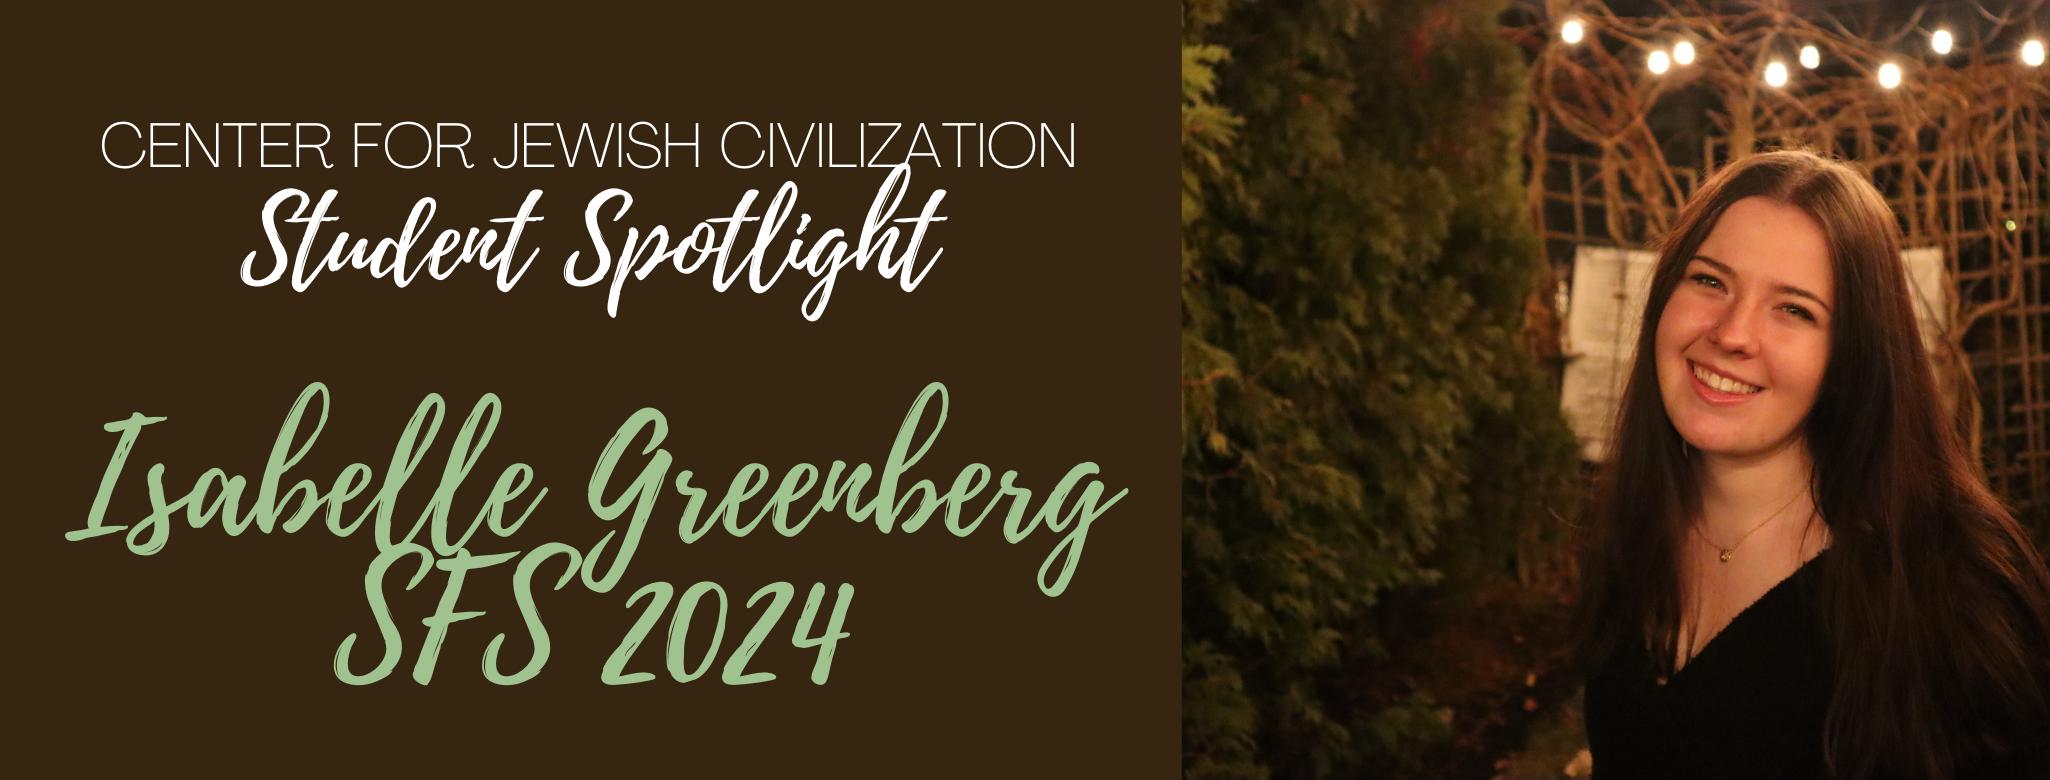 CJC Student Spotlight: Isabelle Greenberg (SFS 2024)